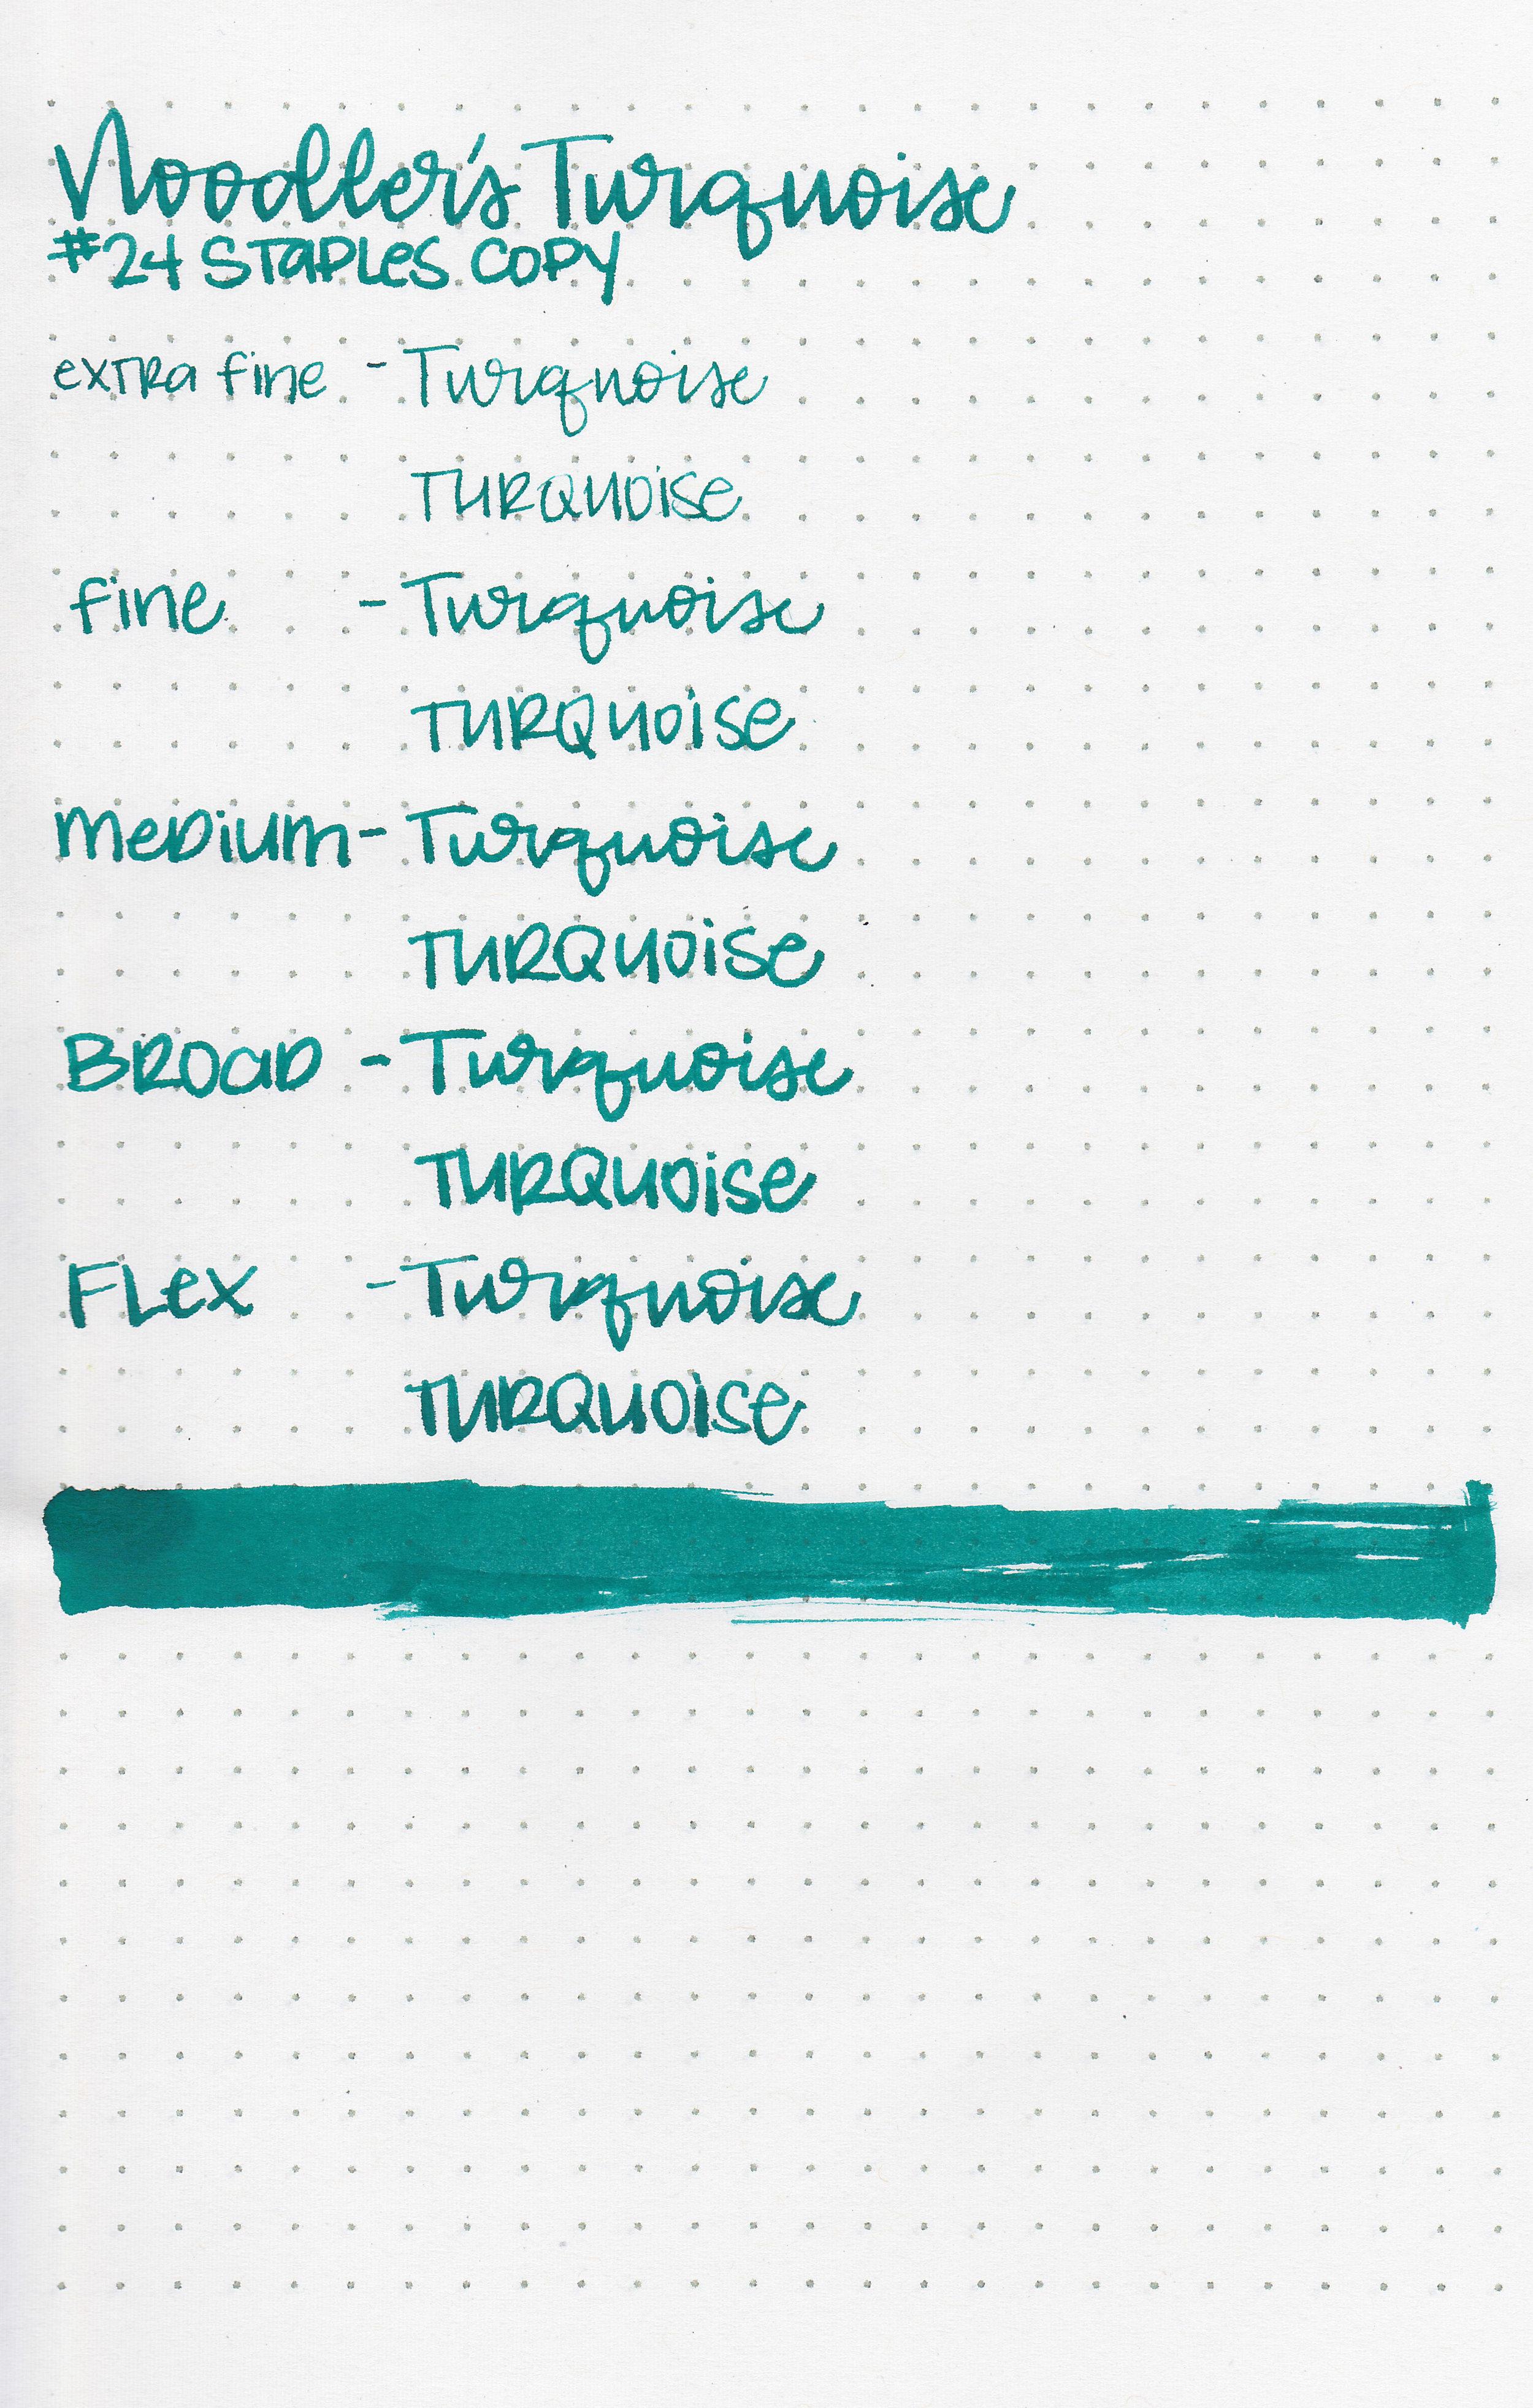 nood-turquoise-11.jpg